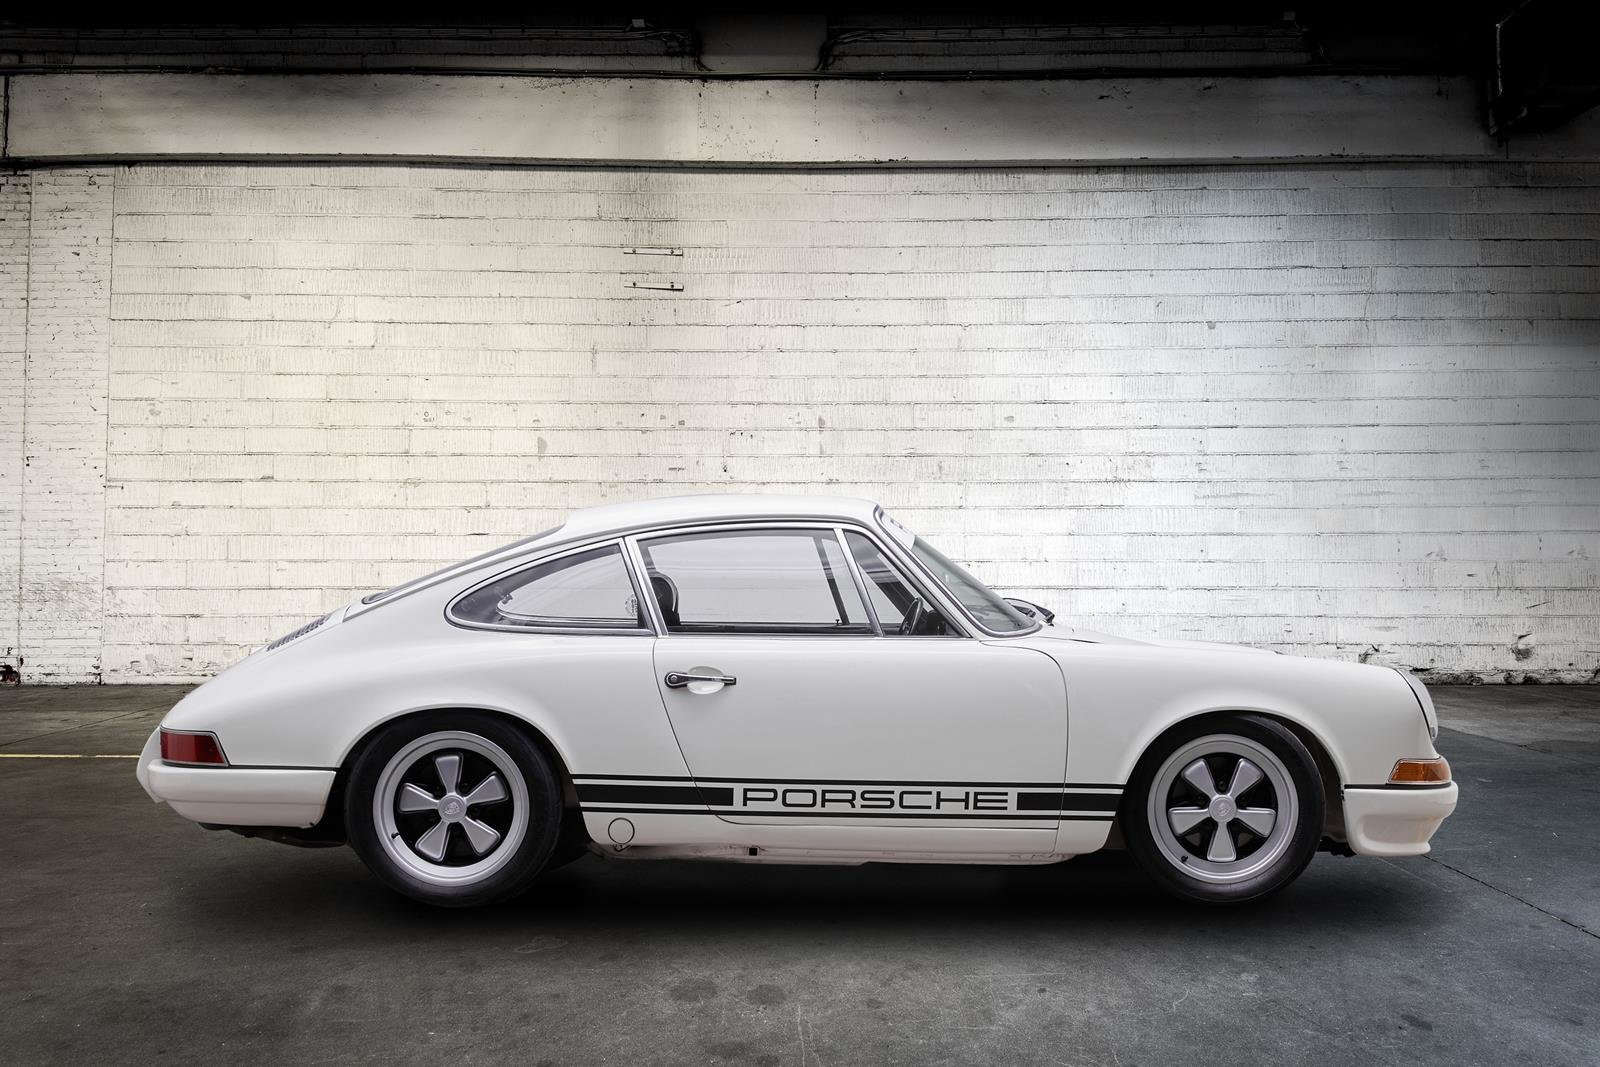 1970 Porsche 911T 2,2 For Sale (picture 6 of 6)